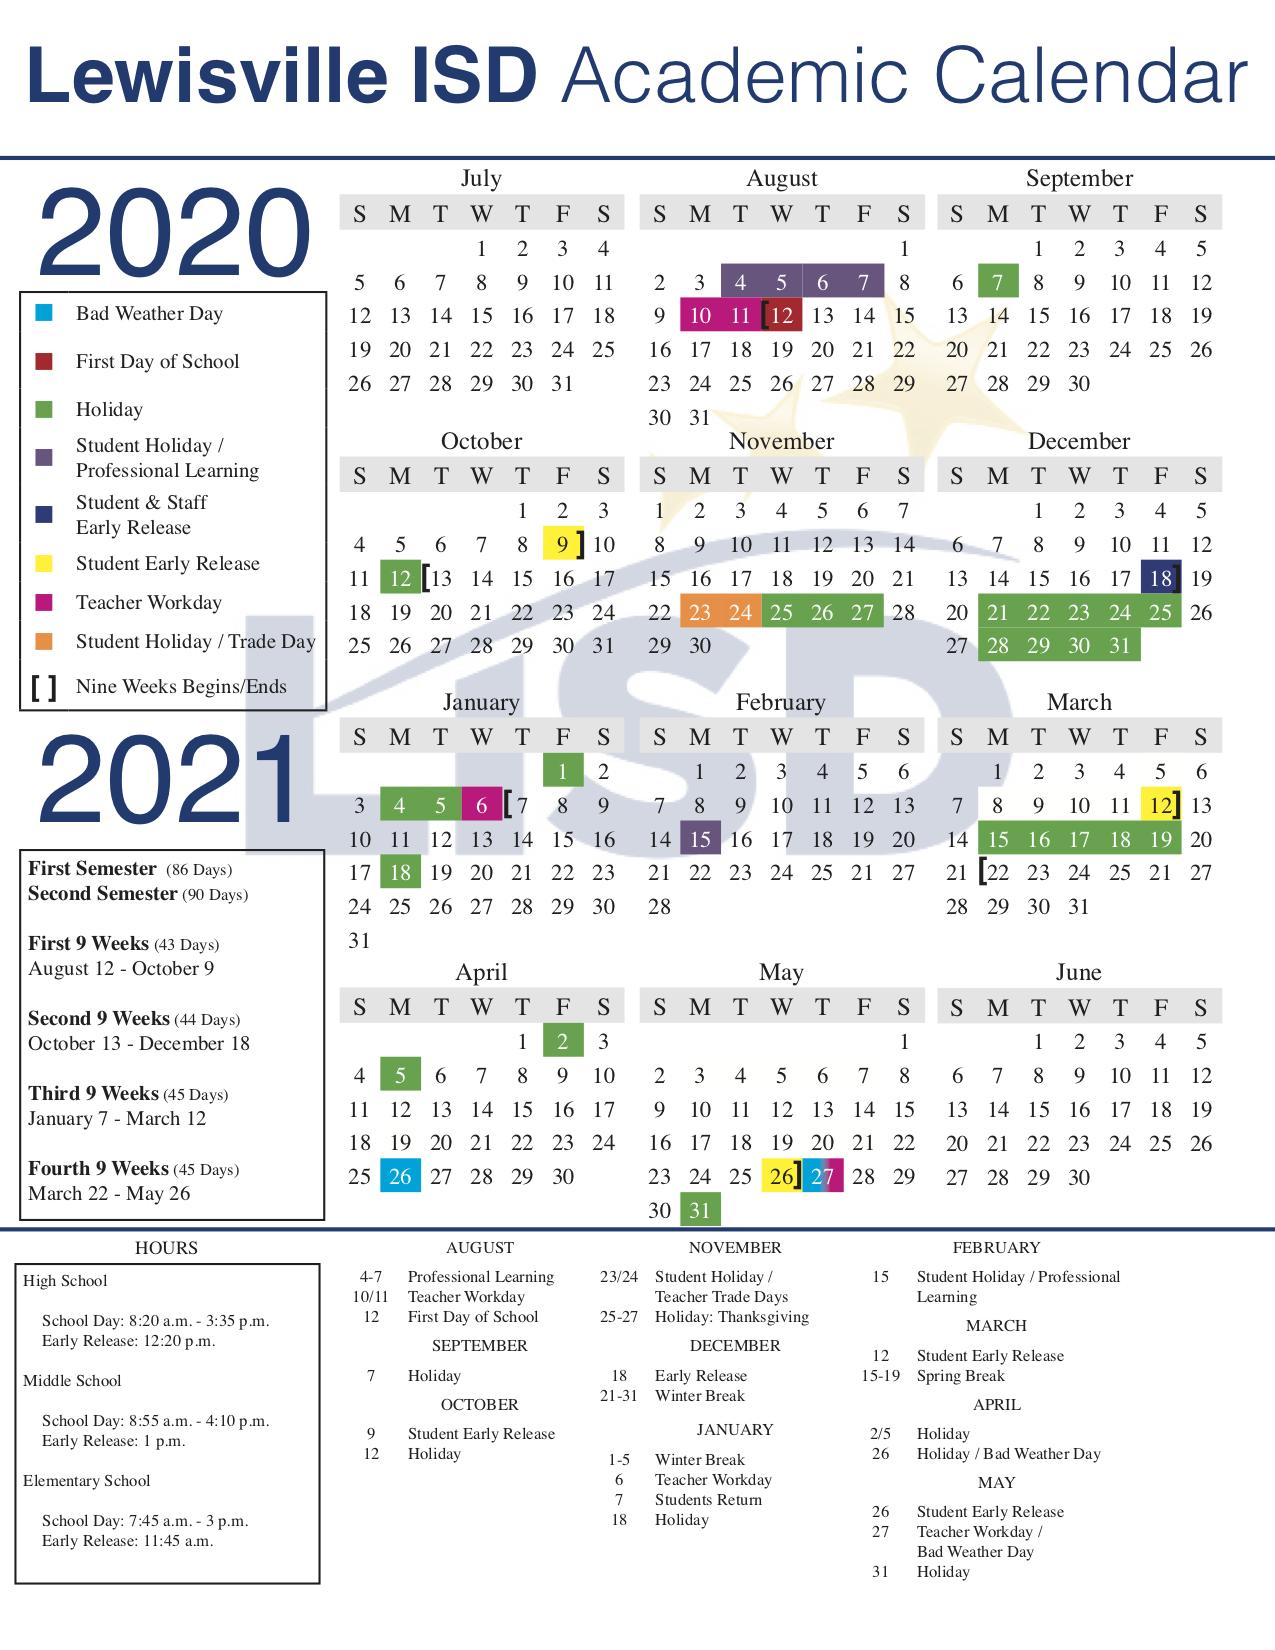 Leap Year Julian Calendar | Printable Calendar 2020 2021 Inside Collin College School Calendar